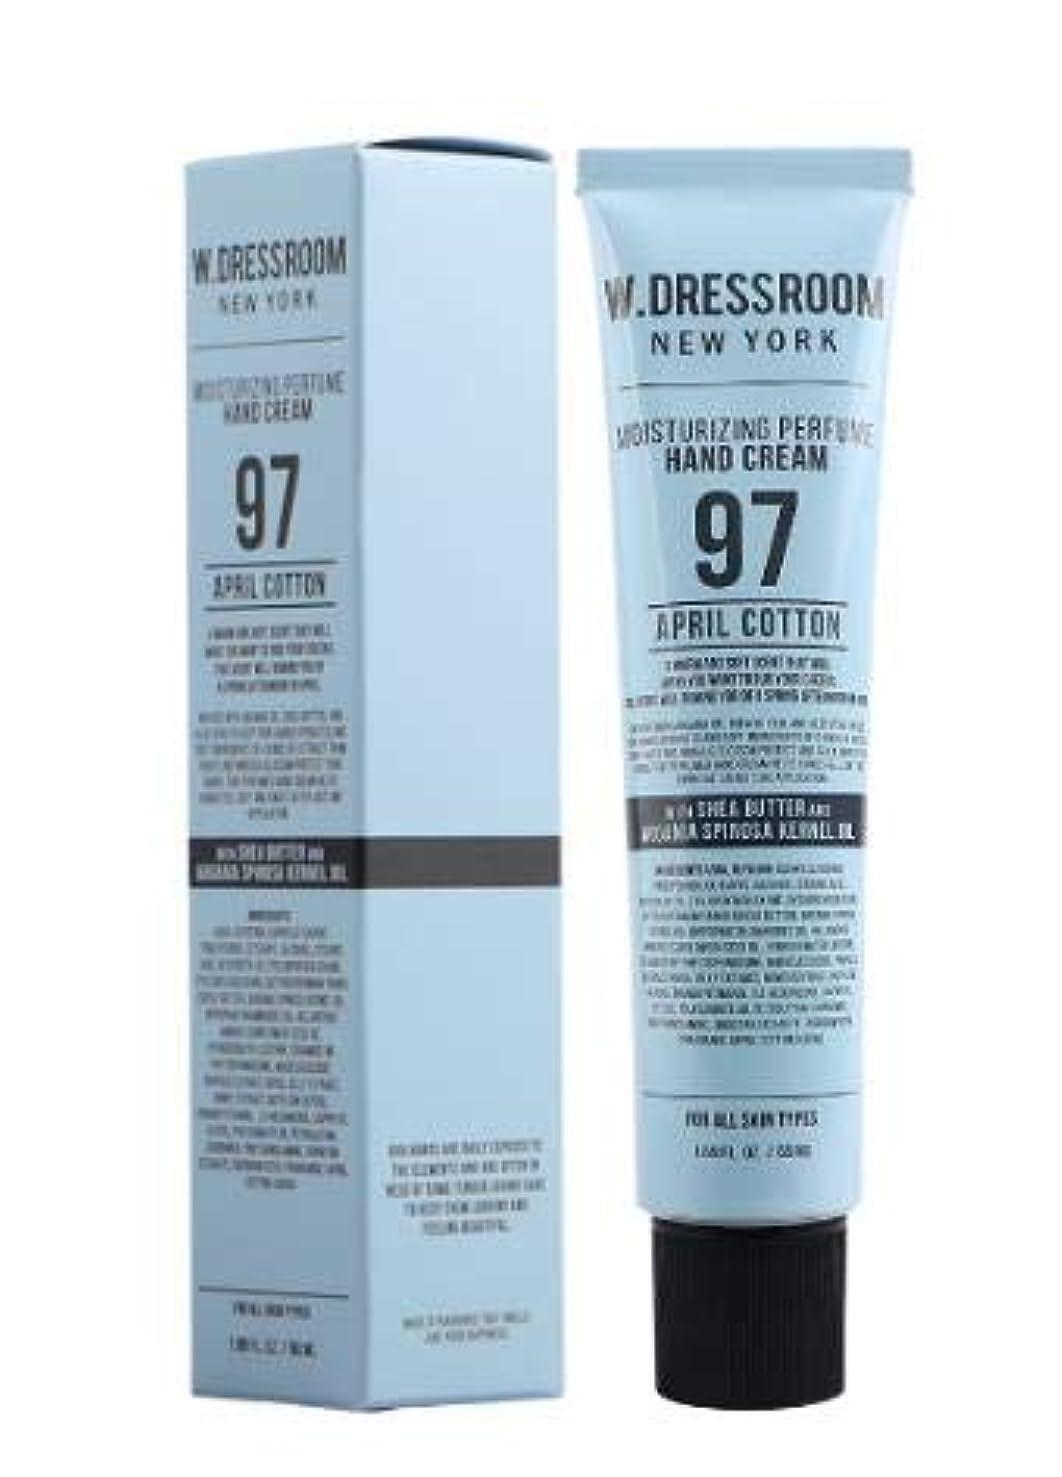 [Renewal] W.DRESSROOM Perfume Hand Cream (NO.97 APRIL COTTON) /パフューム ハンドクリーム [並行輸入品]